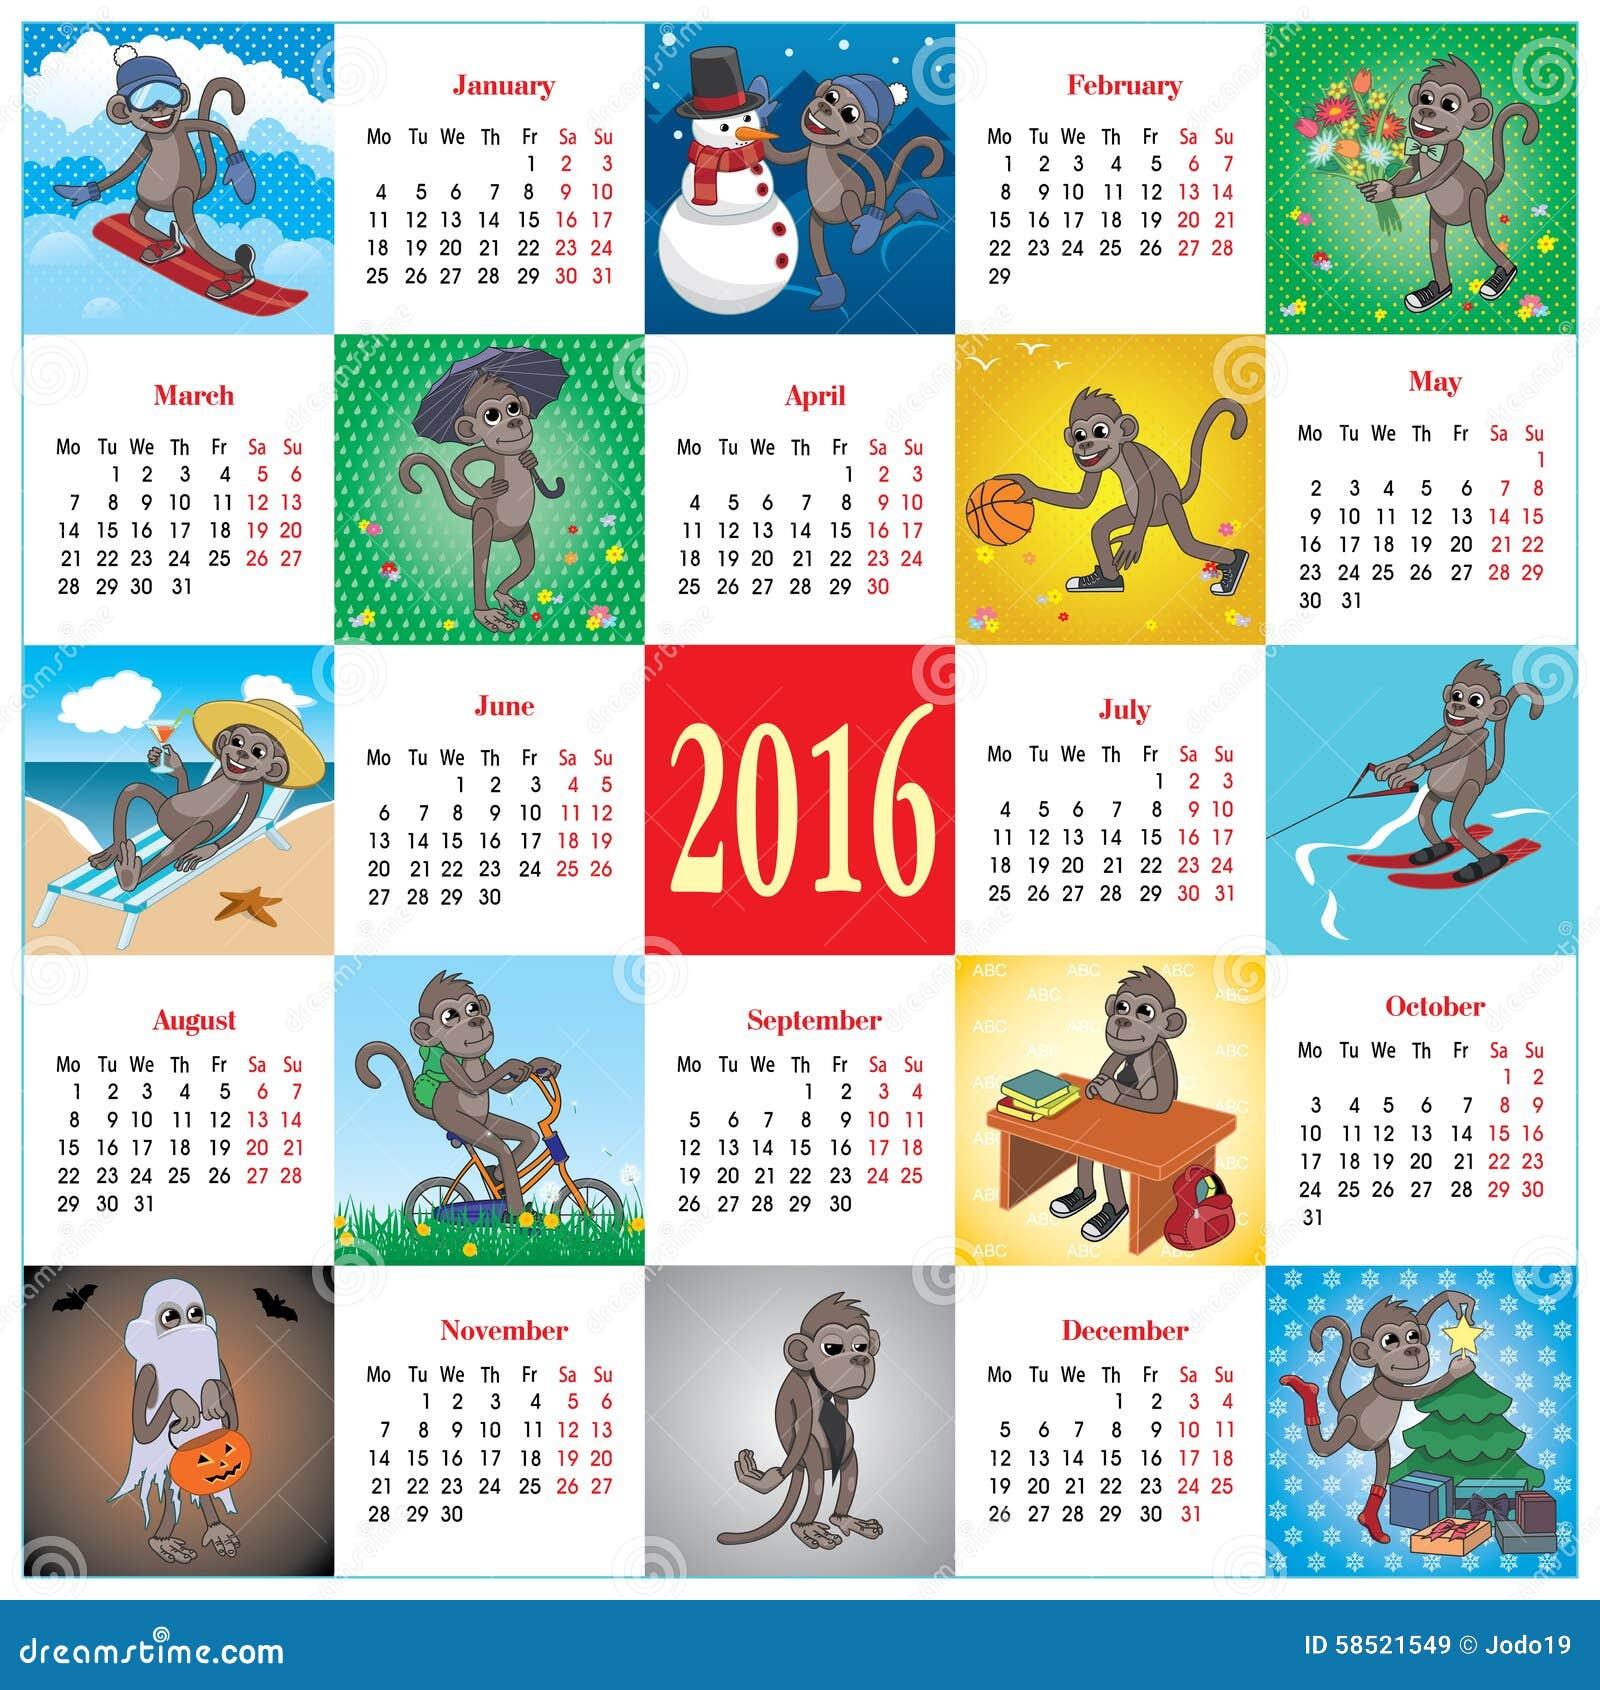 Home Design Editorial Calendar 2016: Calendar 2016 With Monkeys Stock Illustration